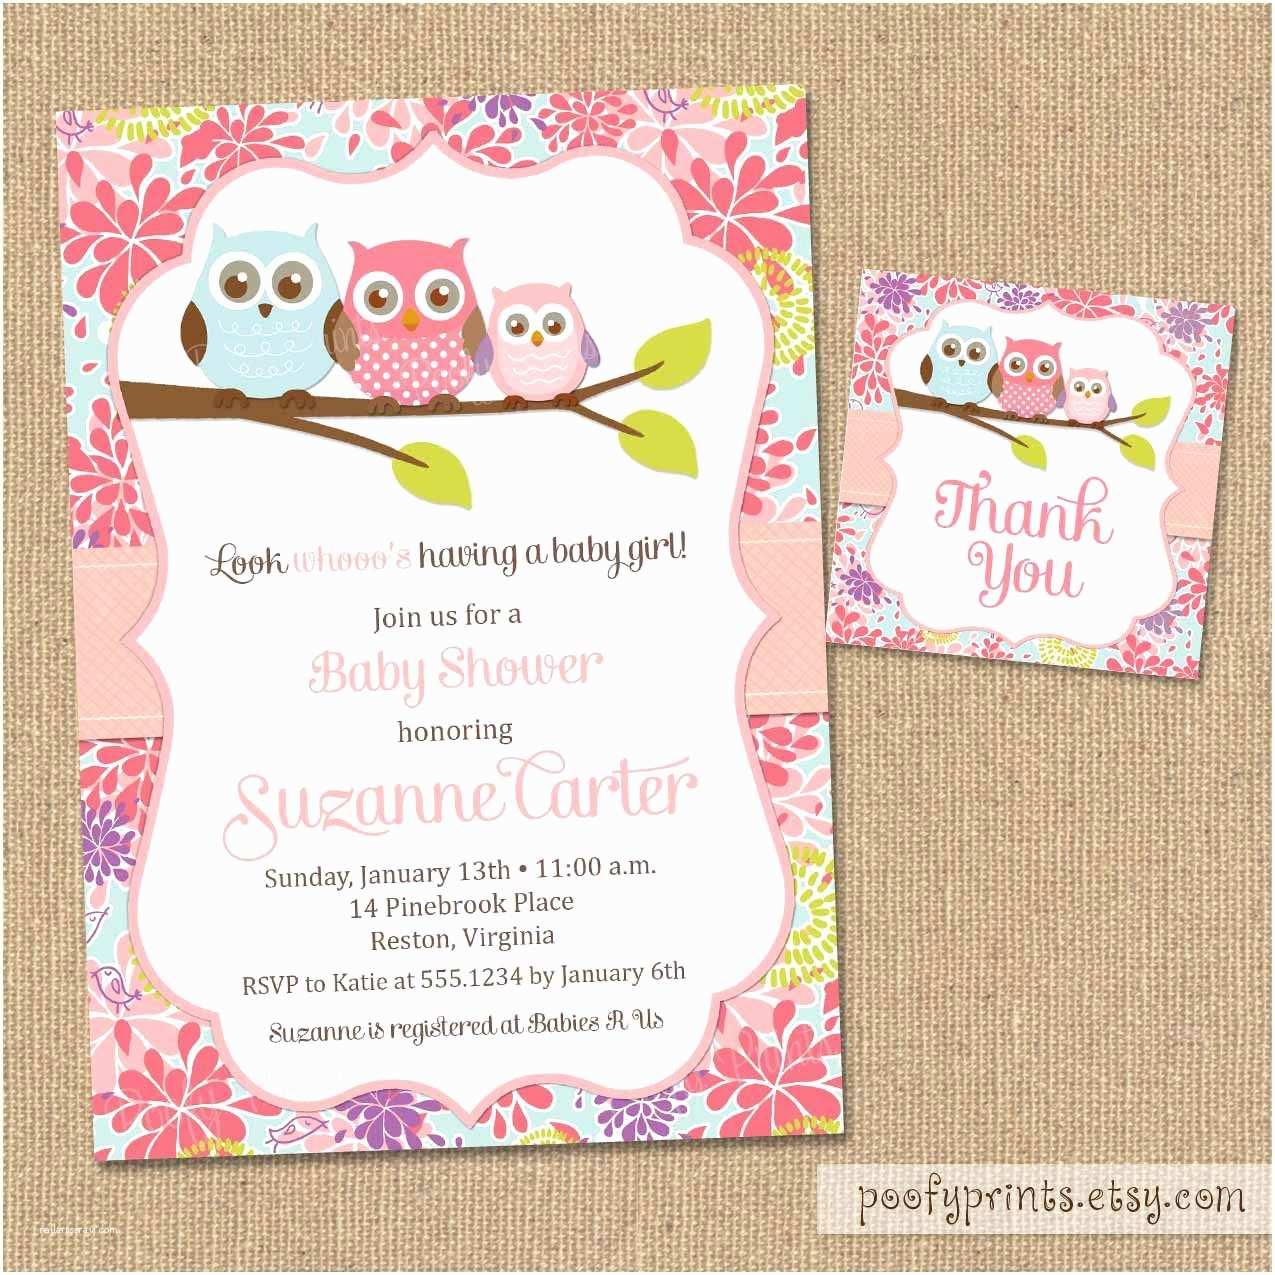 Customizable Baby Shower Invitations Customizable Baby Shower Invitations Free